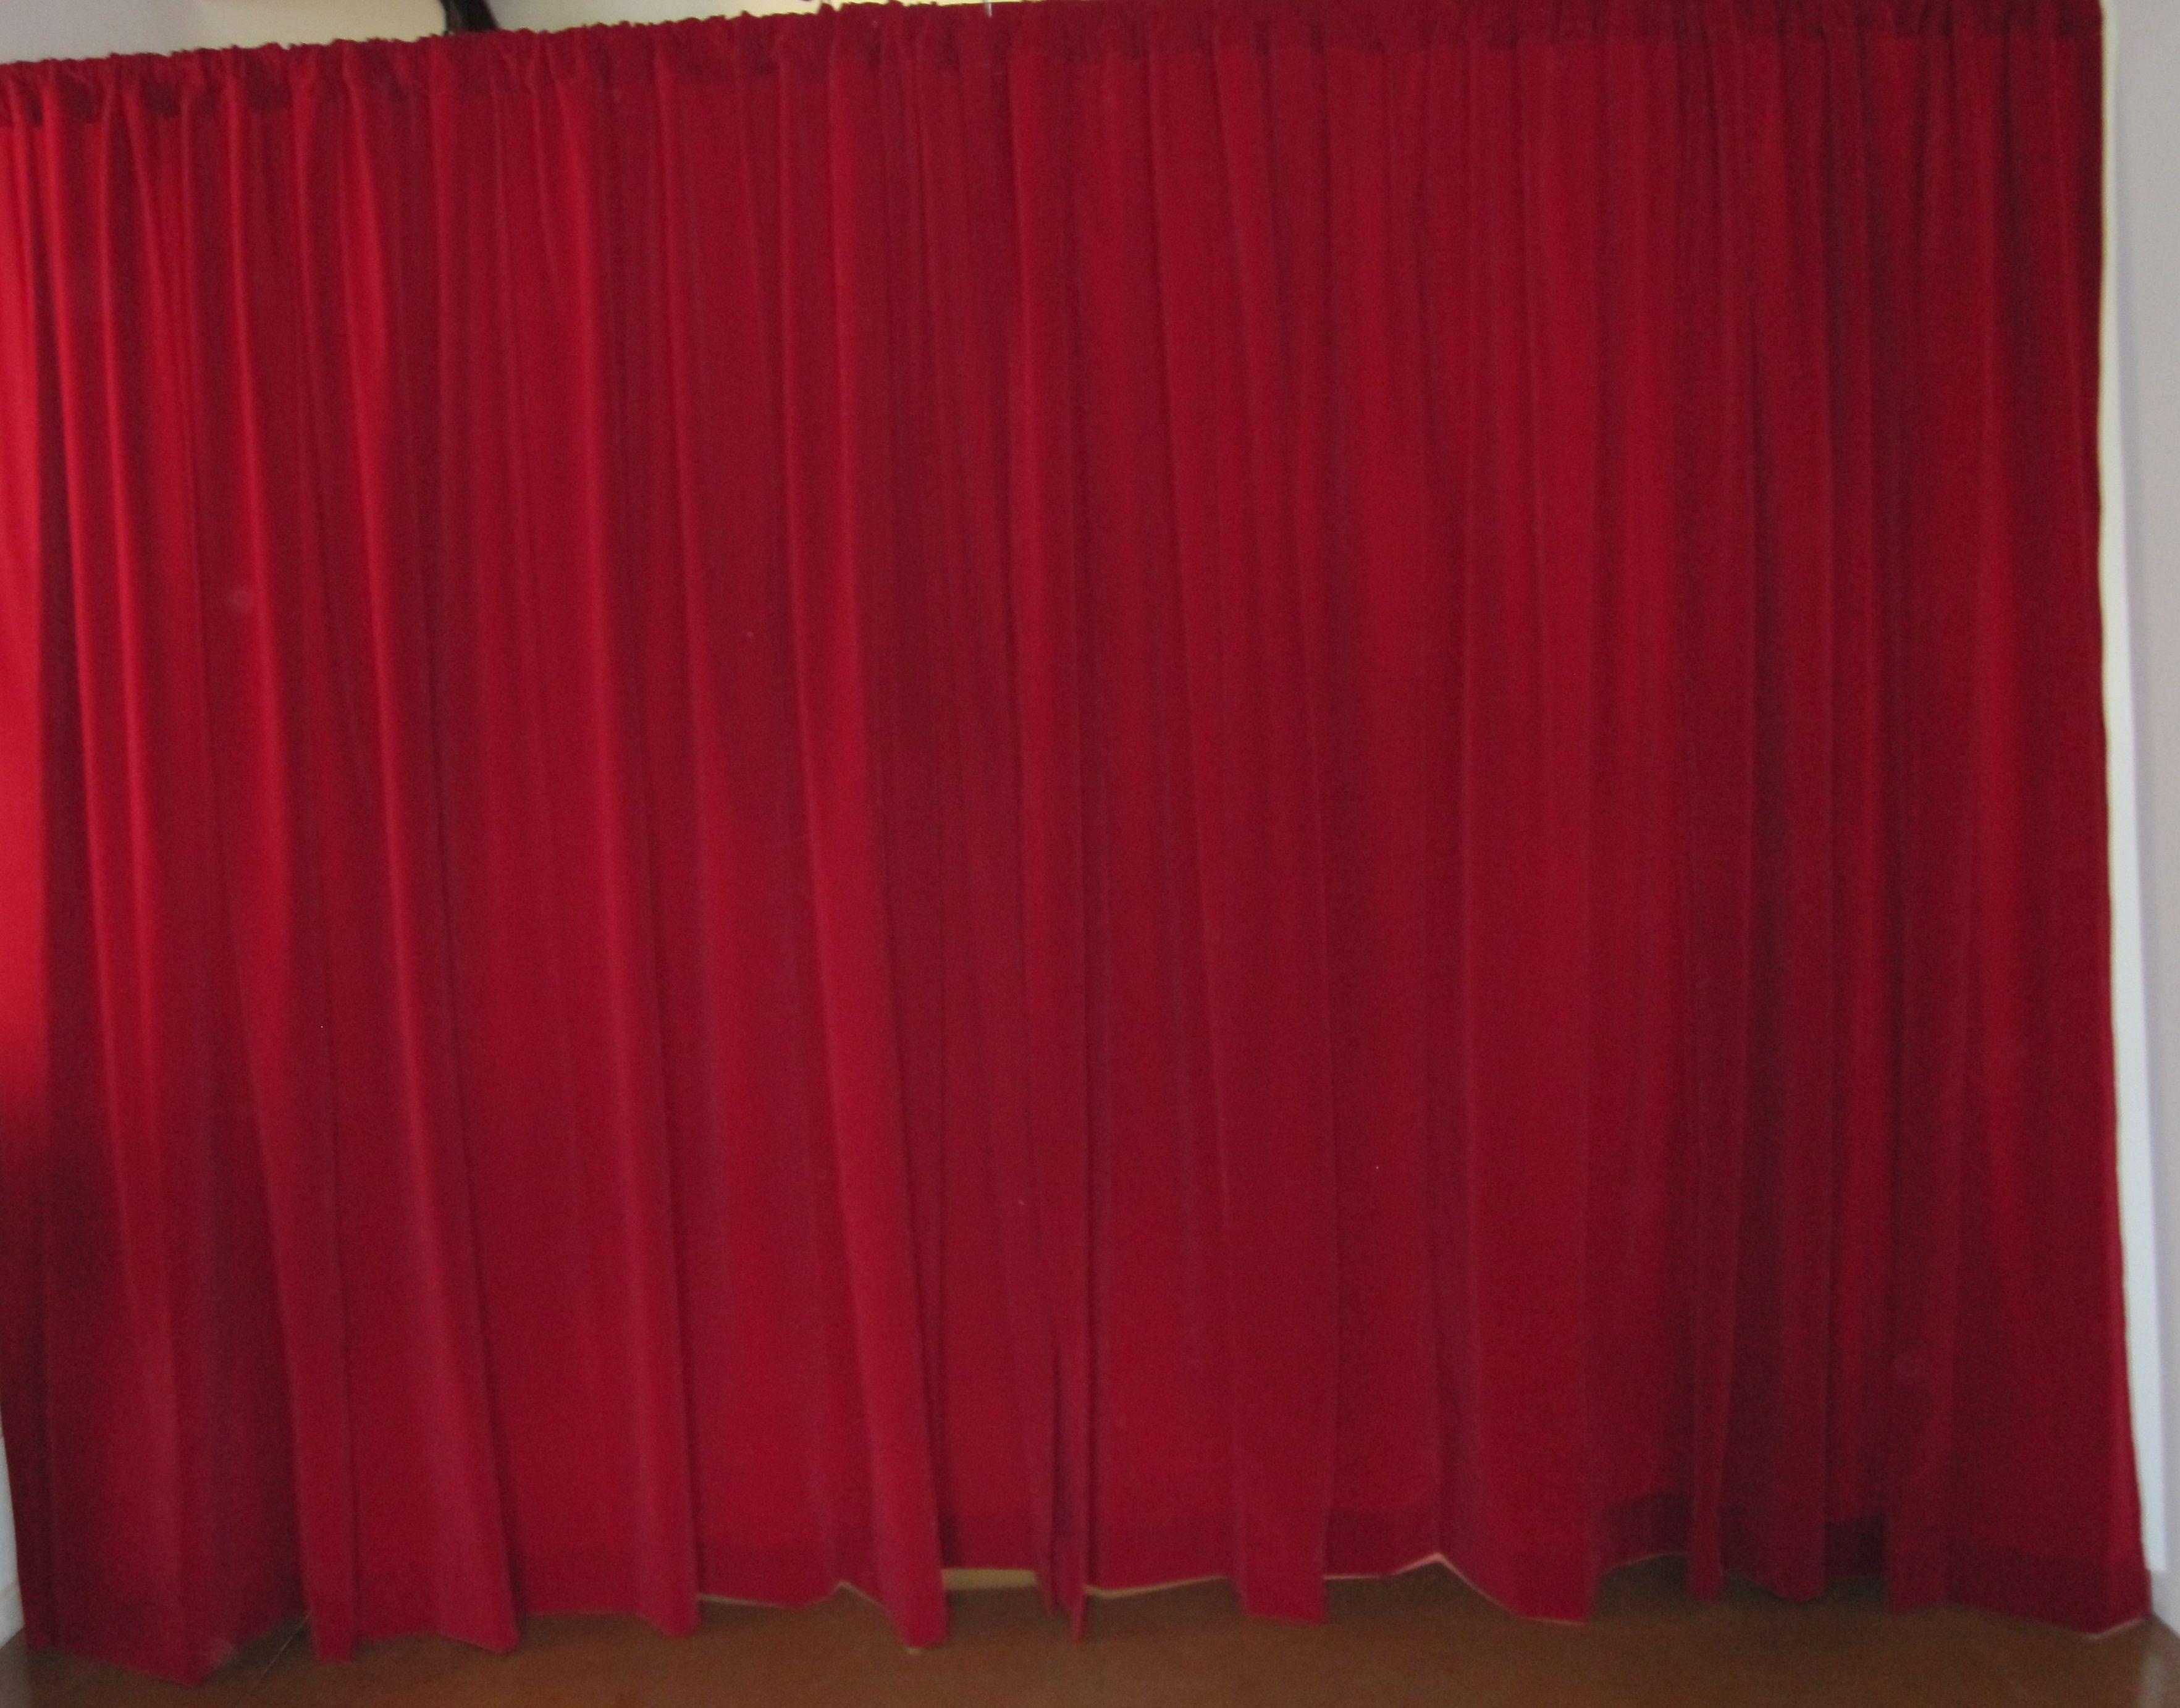 red photo velvet ttatty curtain depositphotos stock curtains